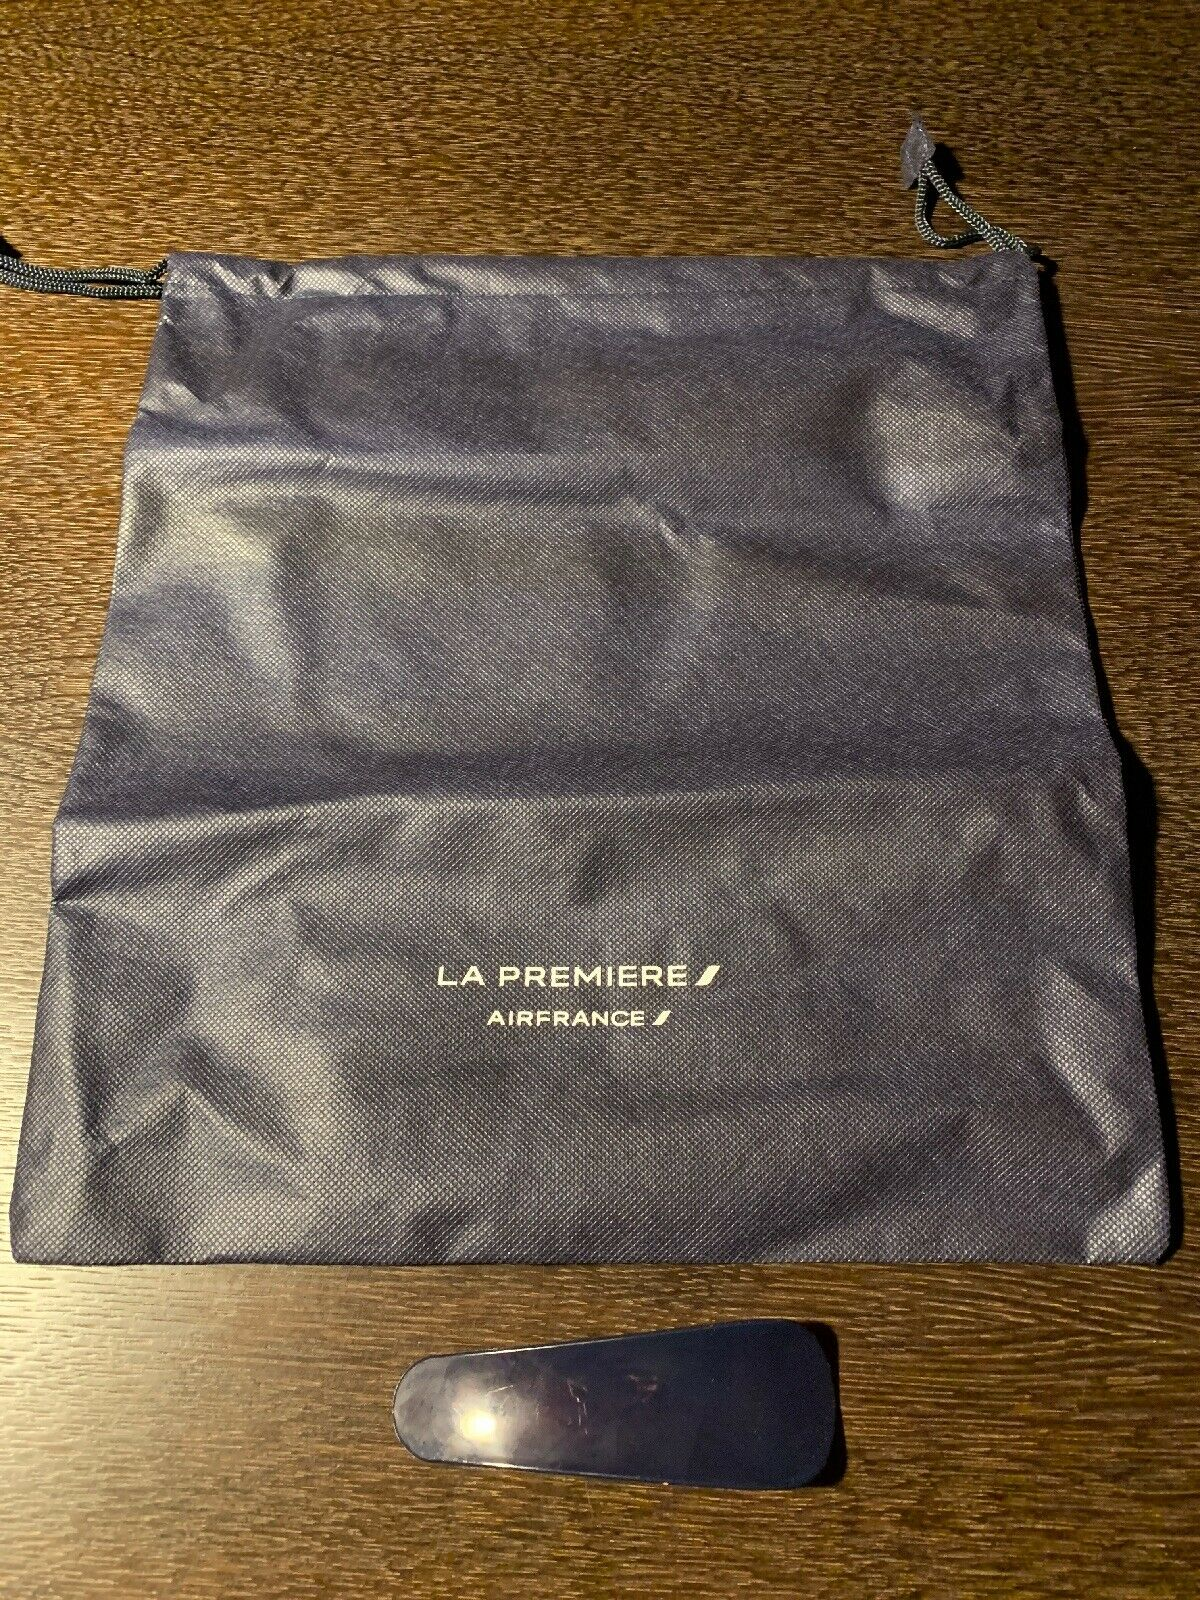 Air France La Première First Class Navy Shoe Bag and Shoe Horn